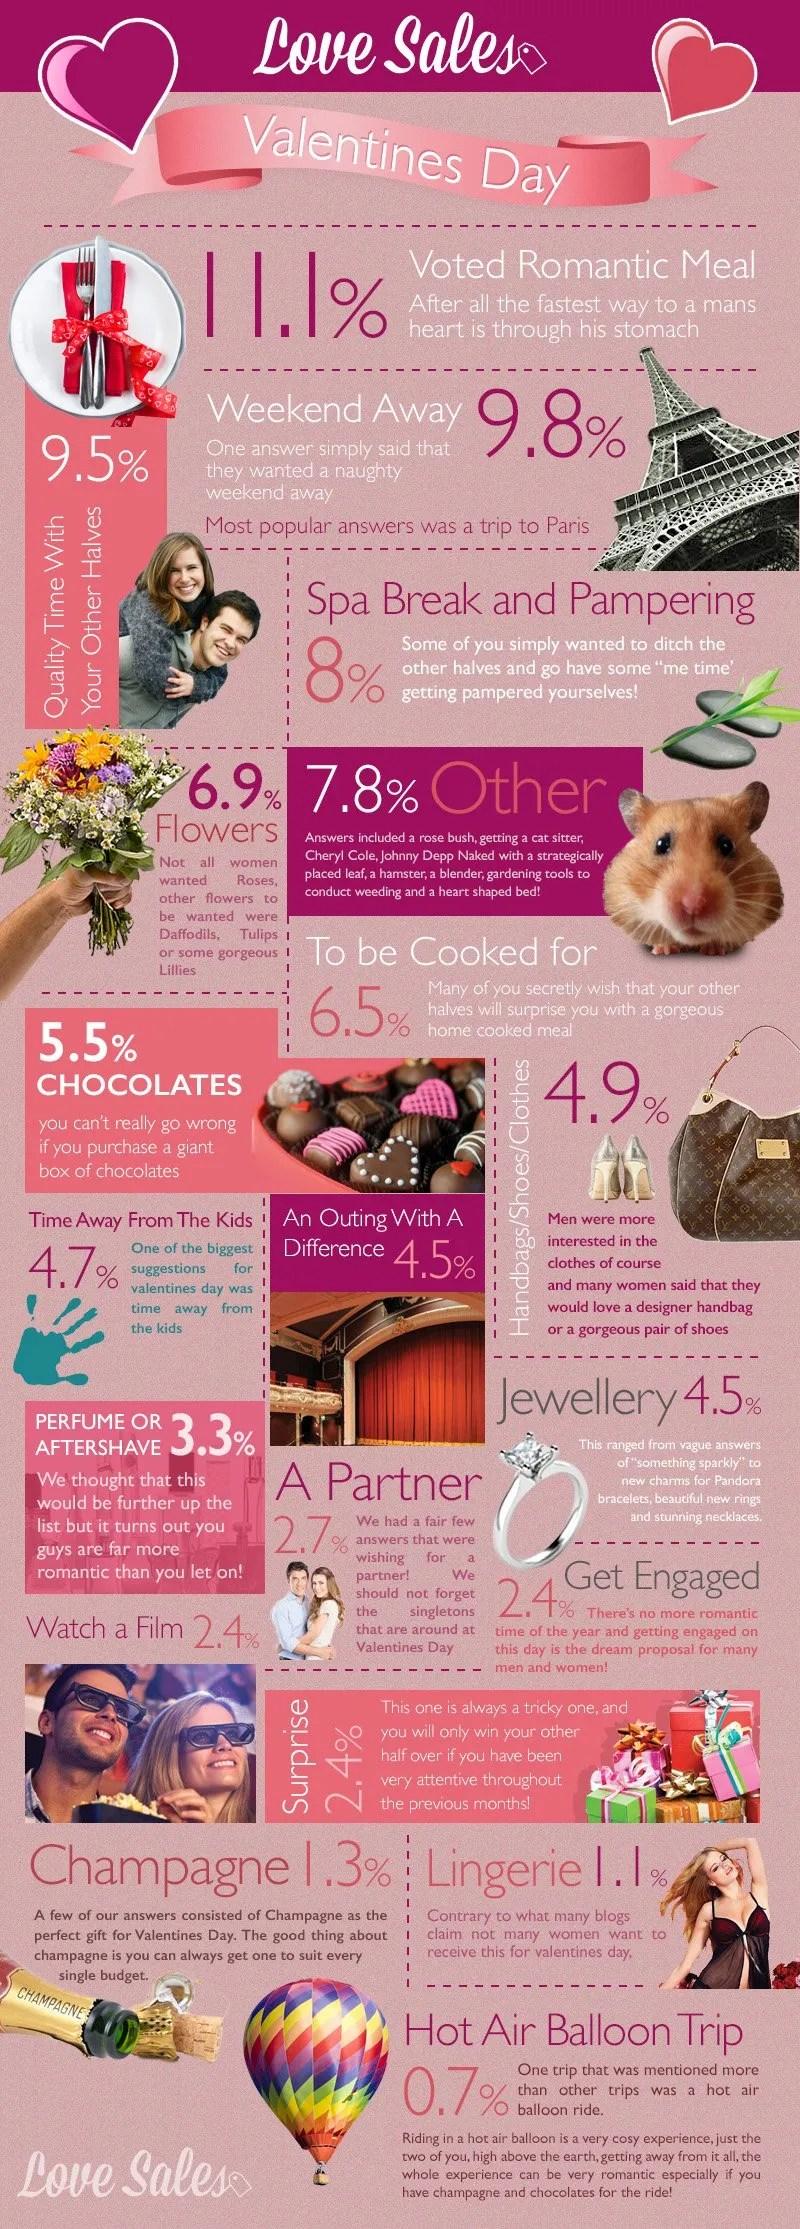 LoveSales_Infographic